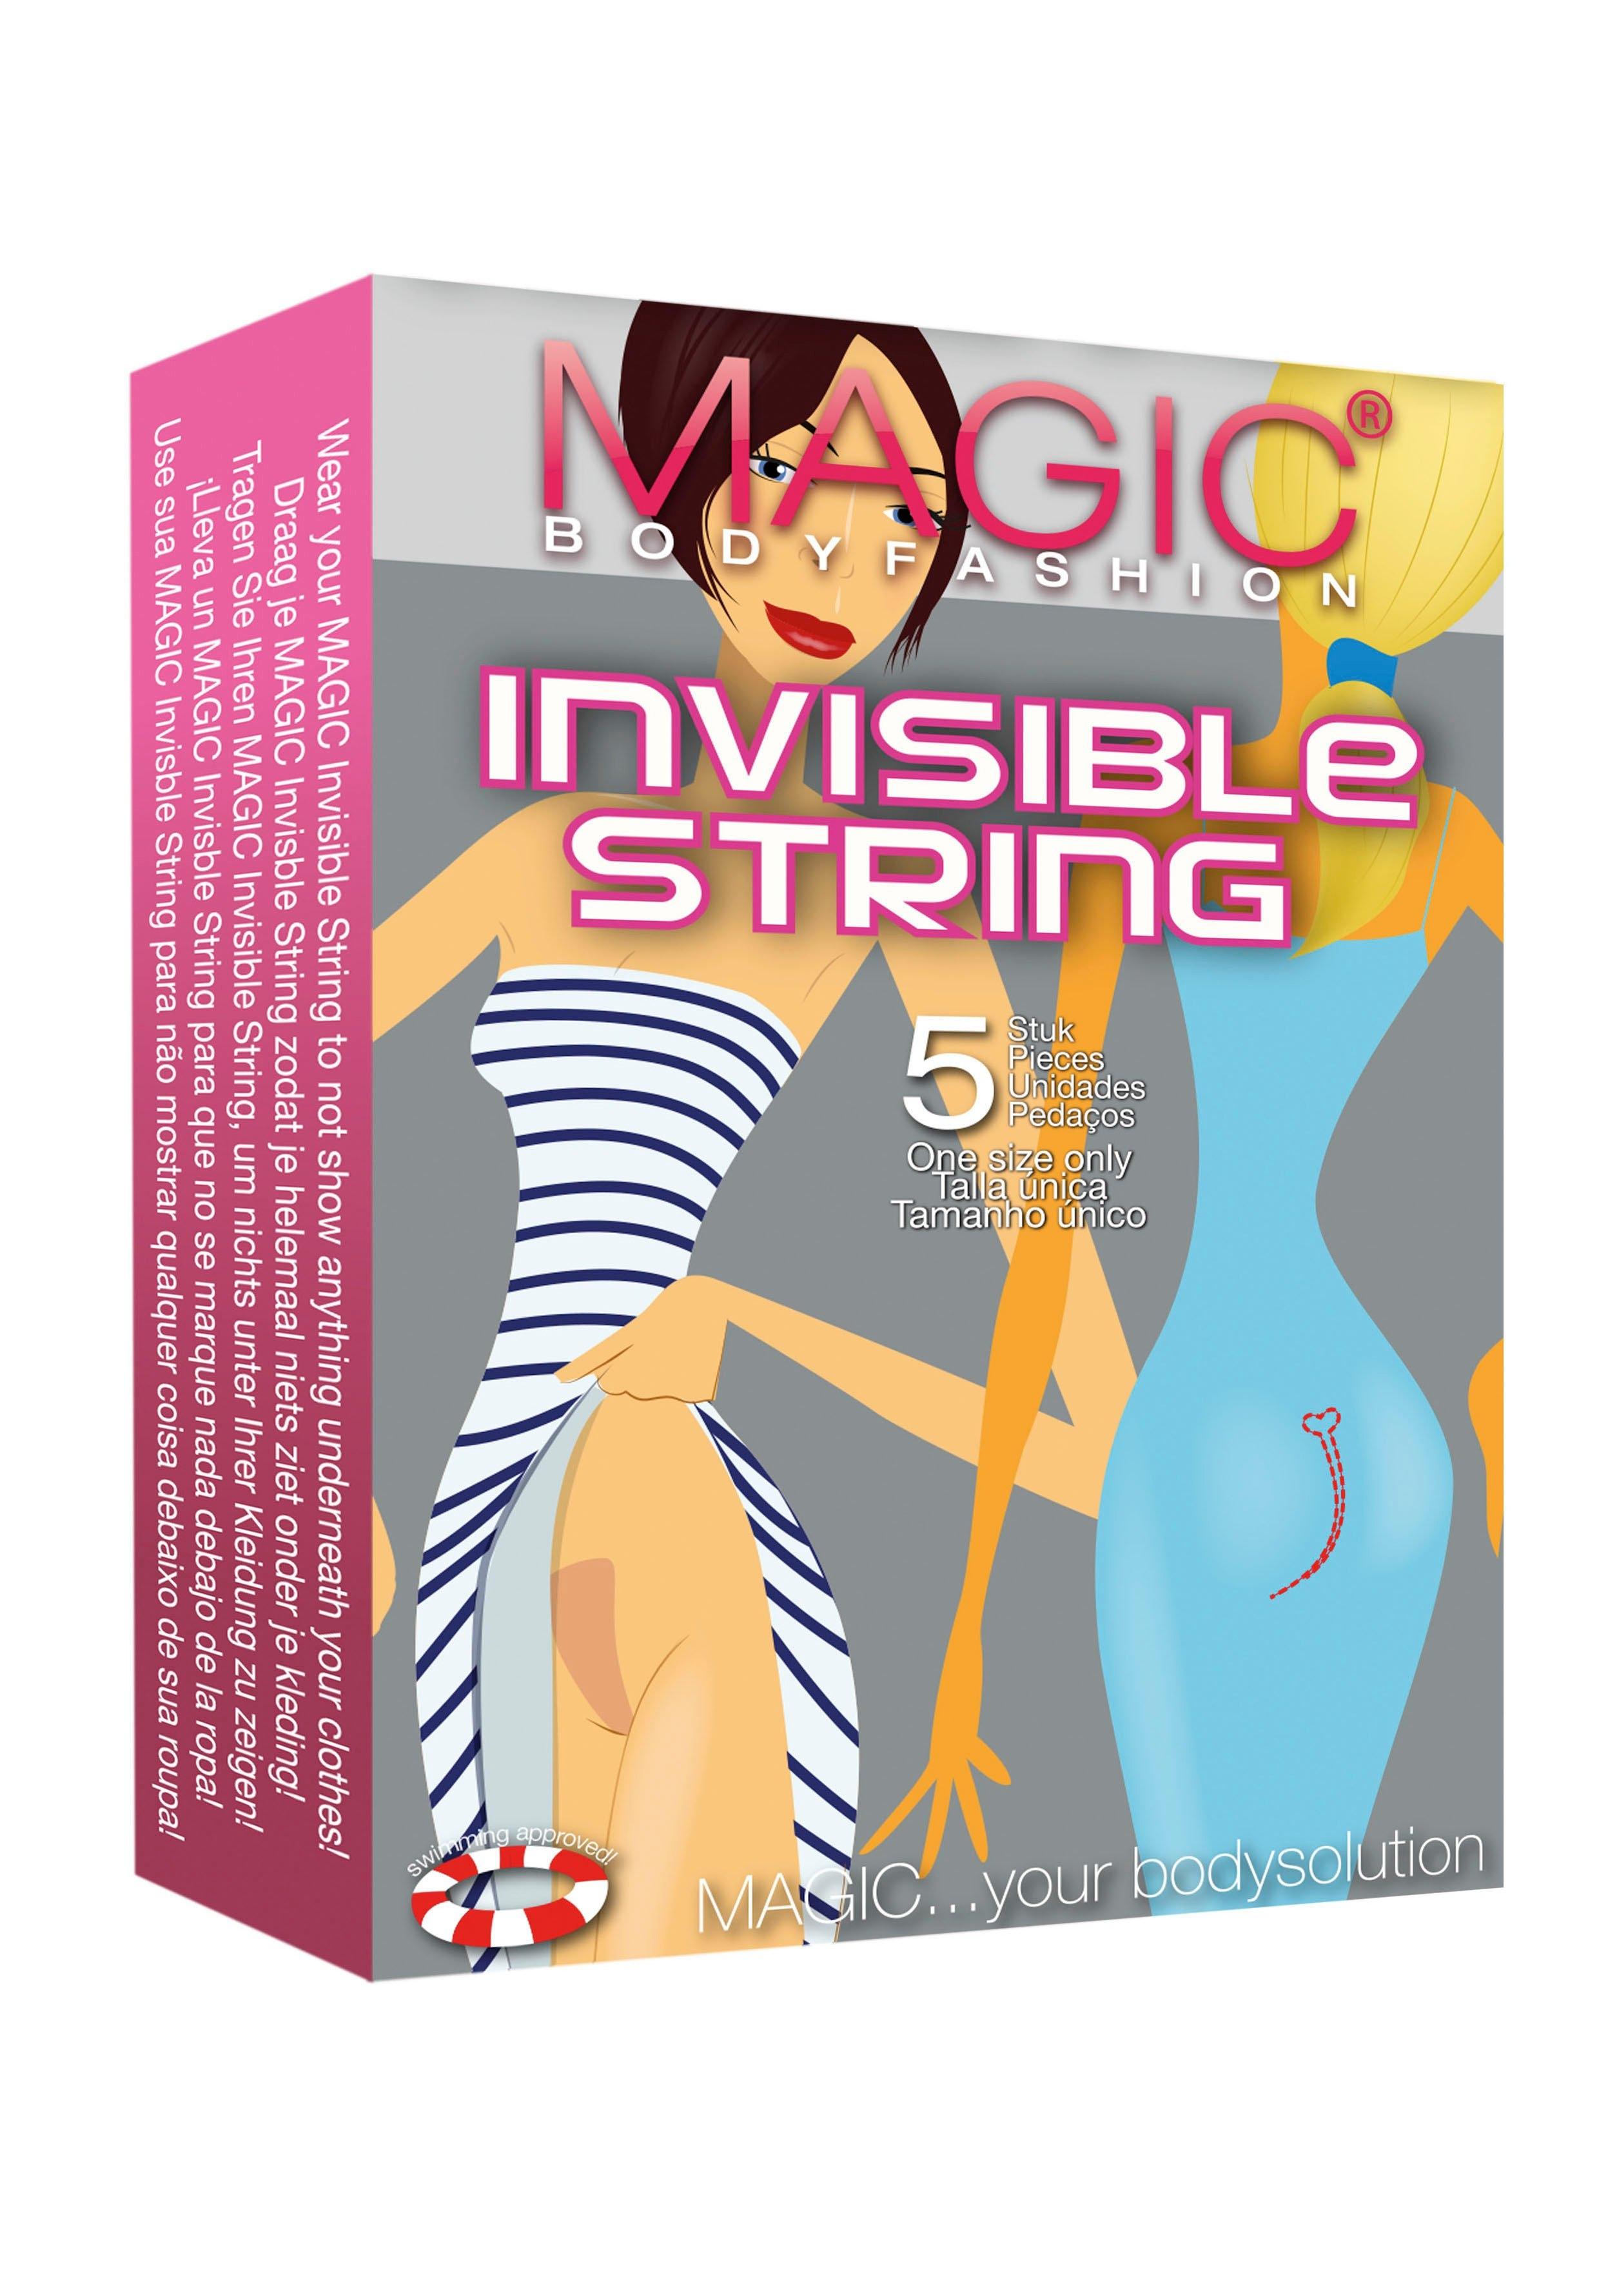 Magic Body Fashion string Invisible String plakken (5 stuks) bij Lascana online kopen